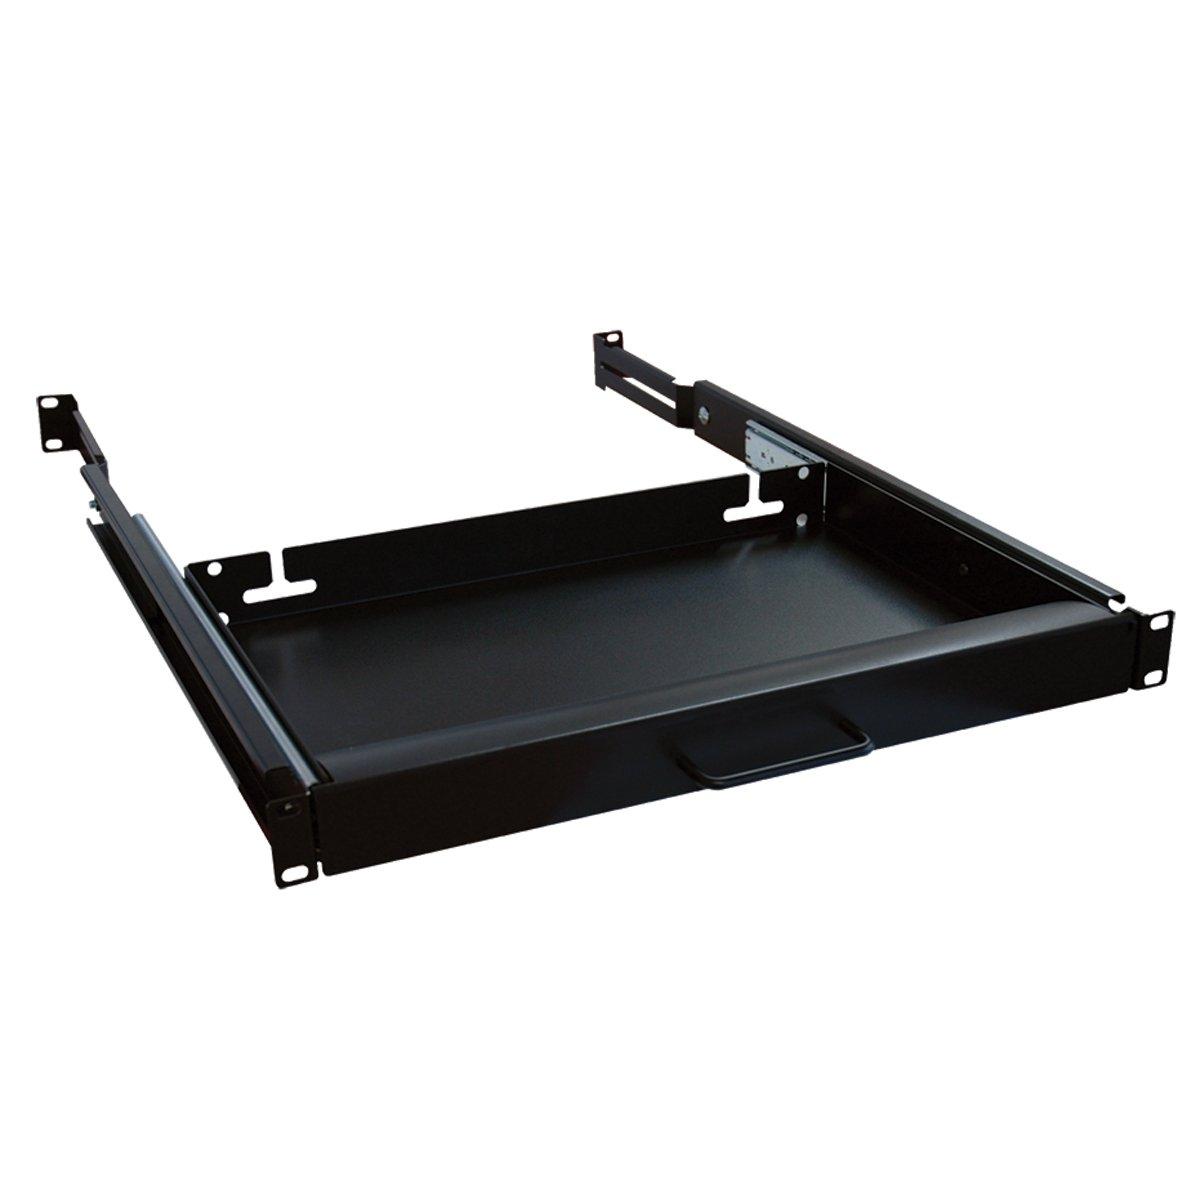 Tripp Lite Rack Enclosure Server Cabinet Keyboard Shelf 25lb Capacity SRSHELF4PKYBD